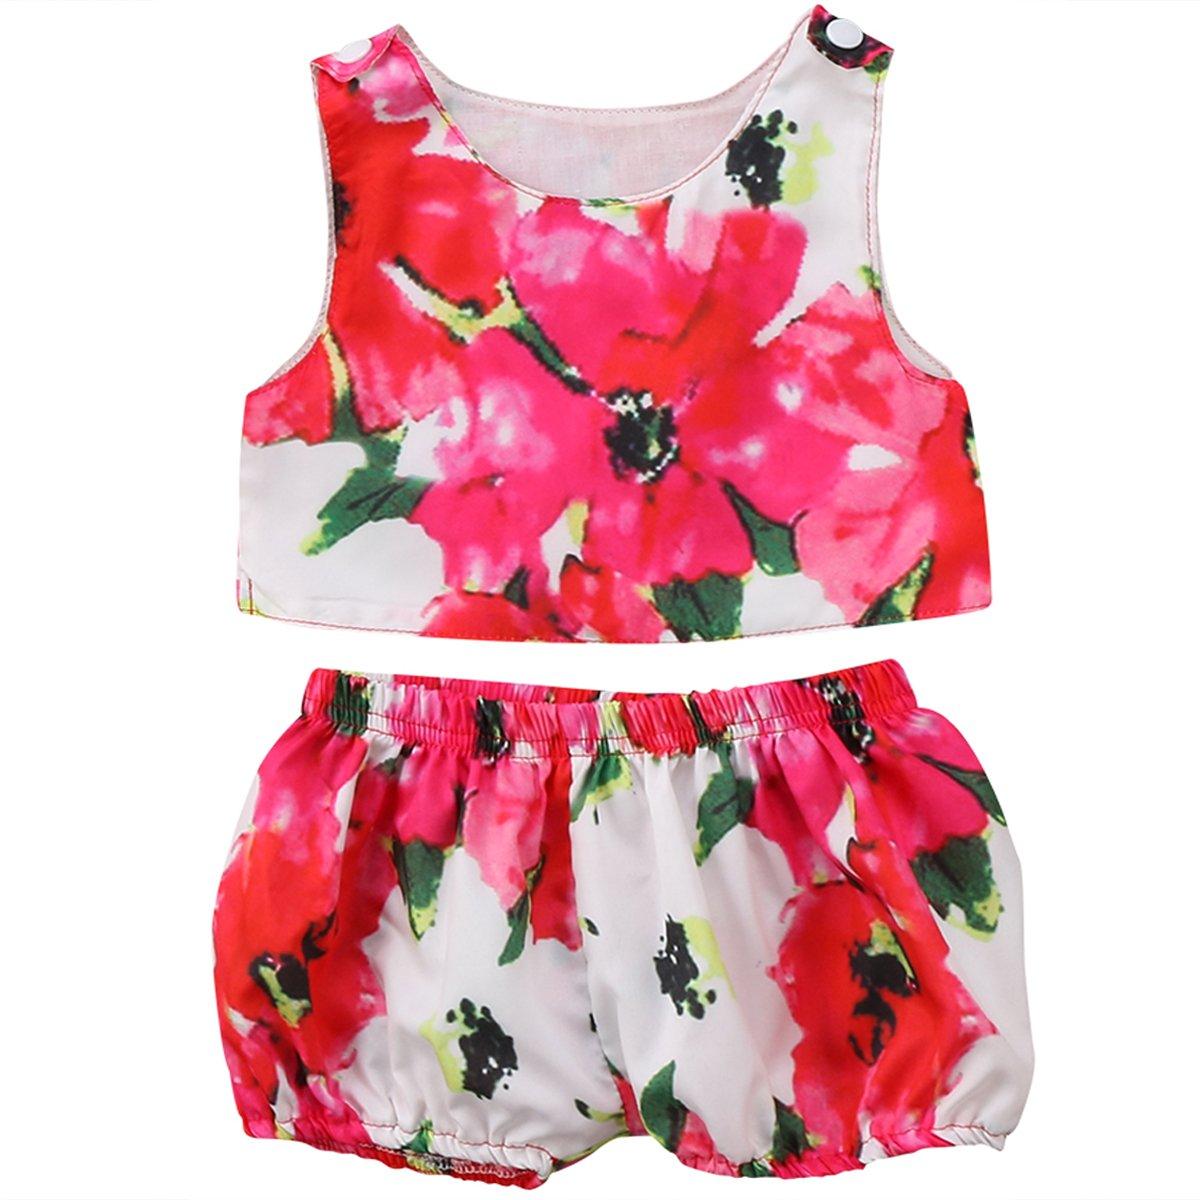 Annvivi Baby Girls Red Floral Vest Top Short Pants 2Pcs Shorts Outfit Set (Red, 18-24 Months)